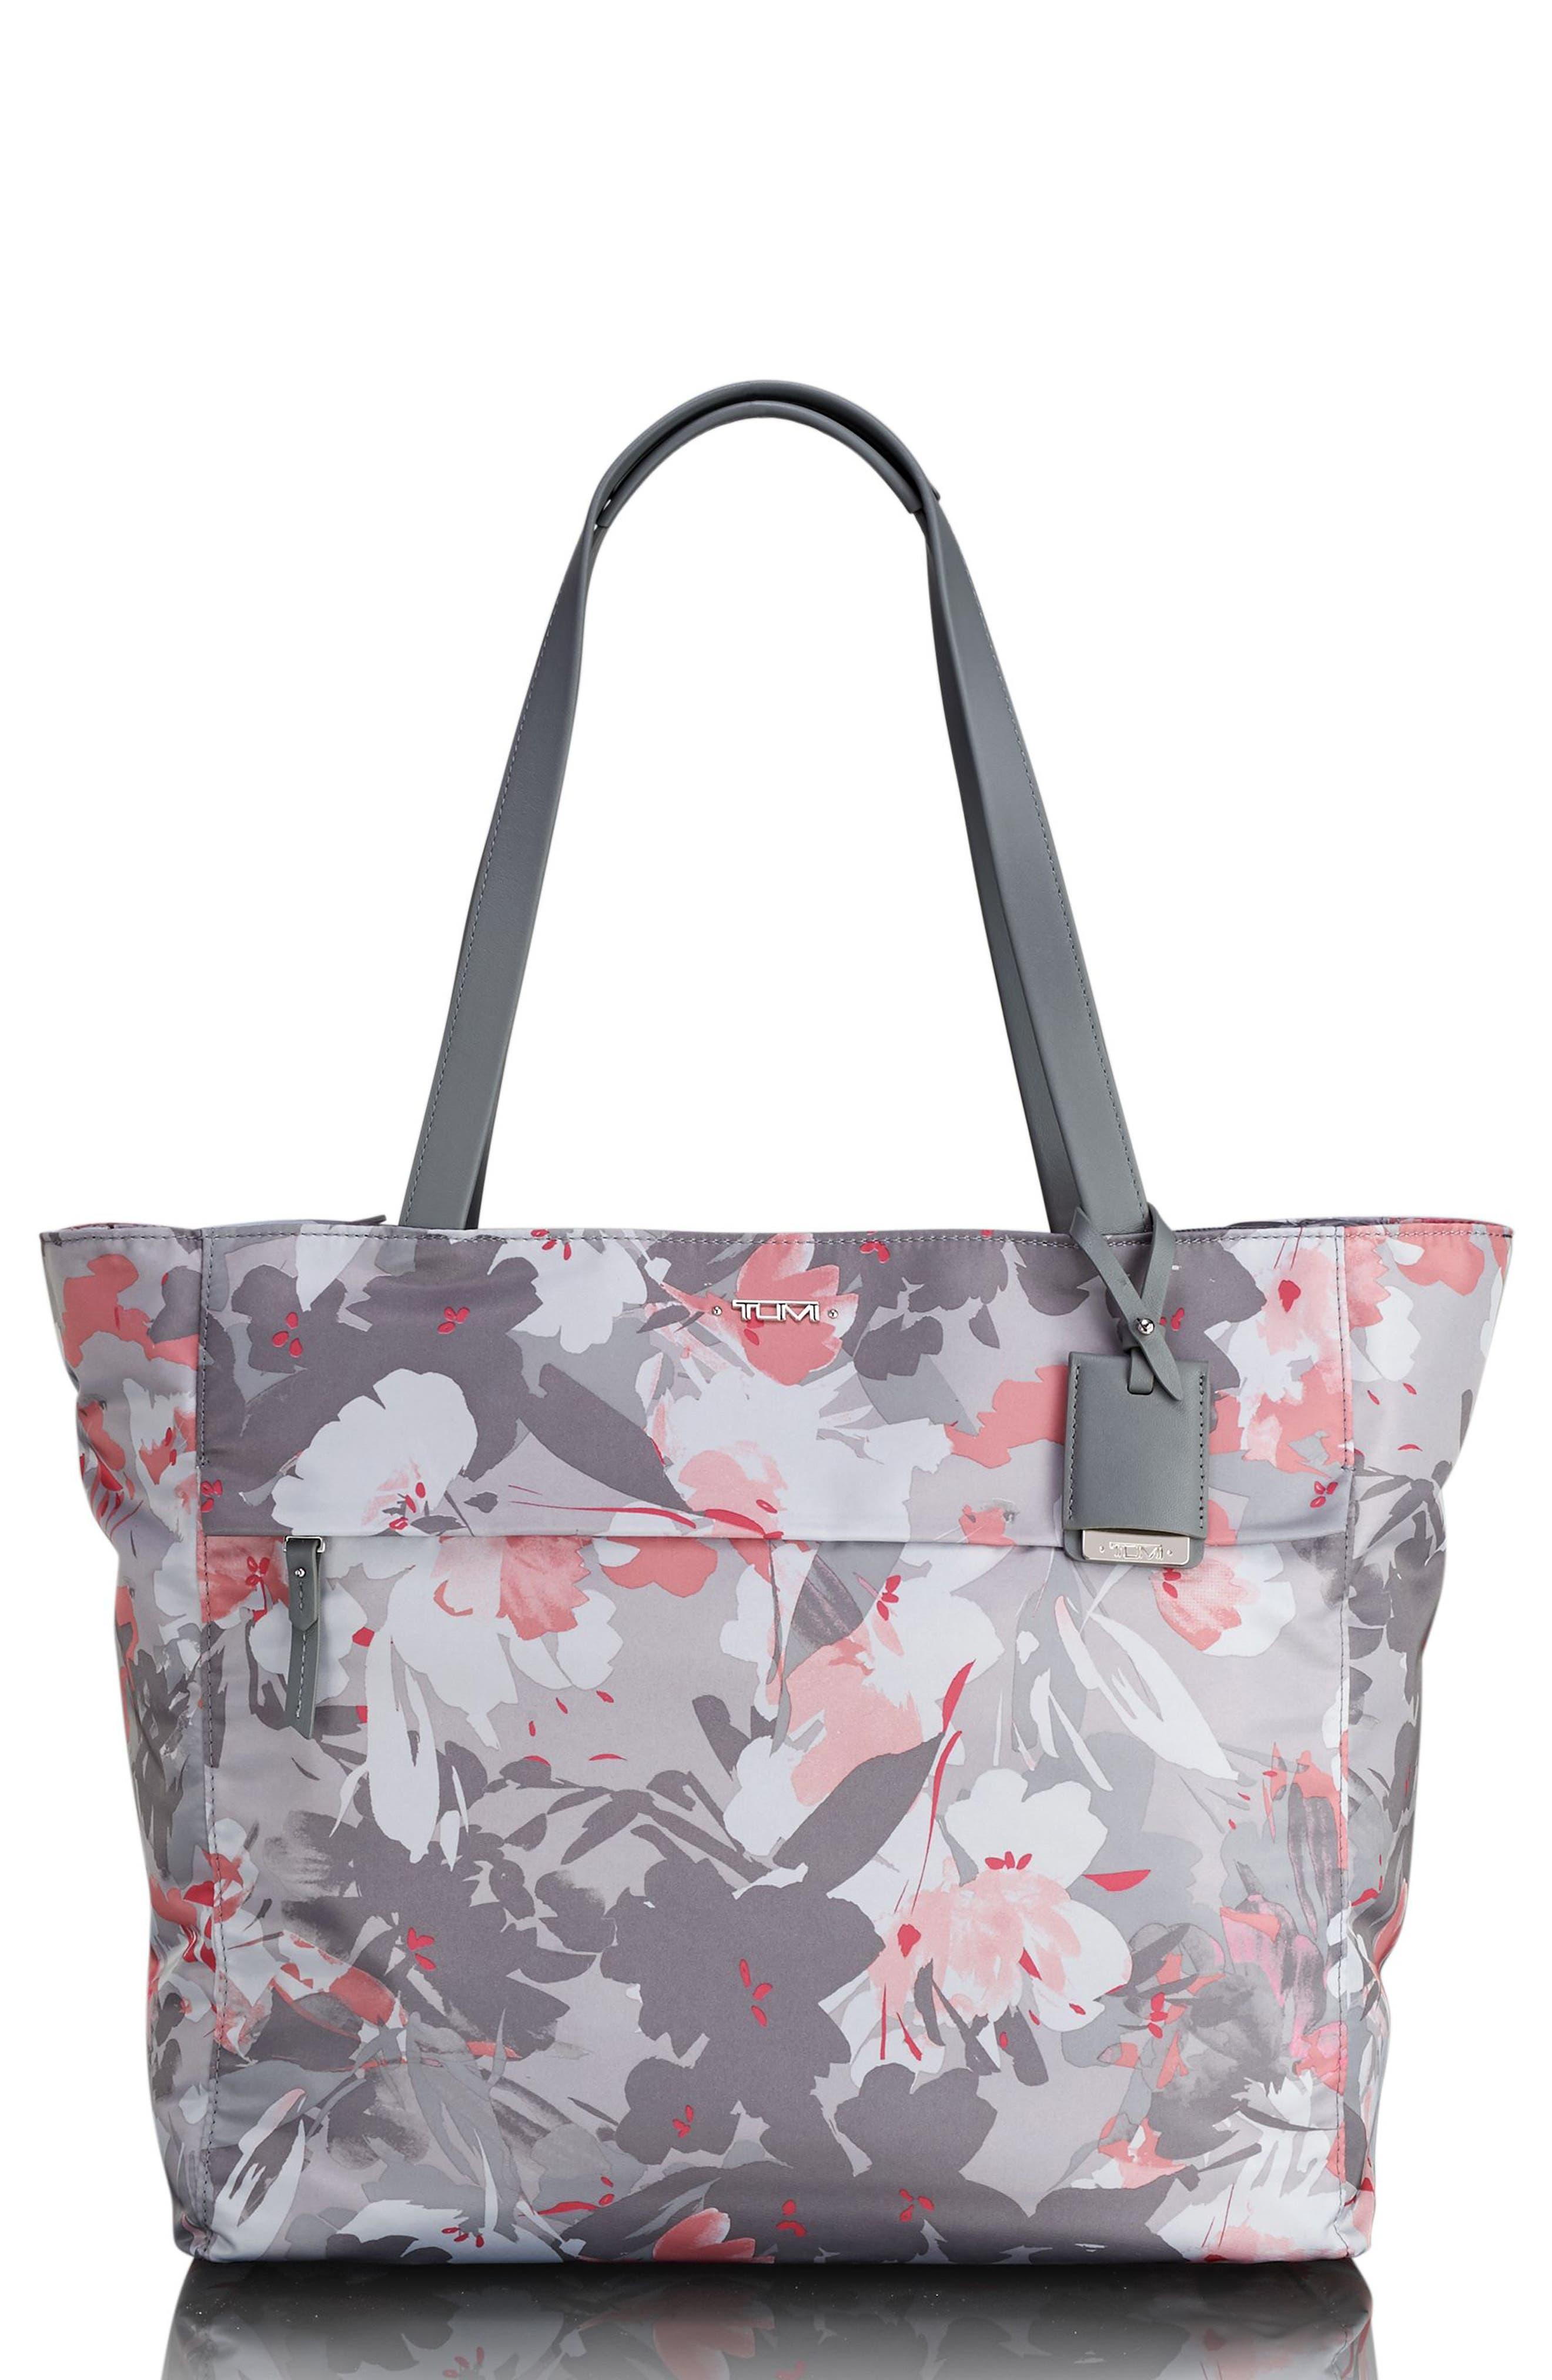 Voyageur - M Nylon Tote,                         Main,                         color, Grey Floral Print